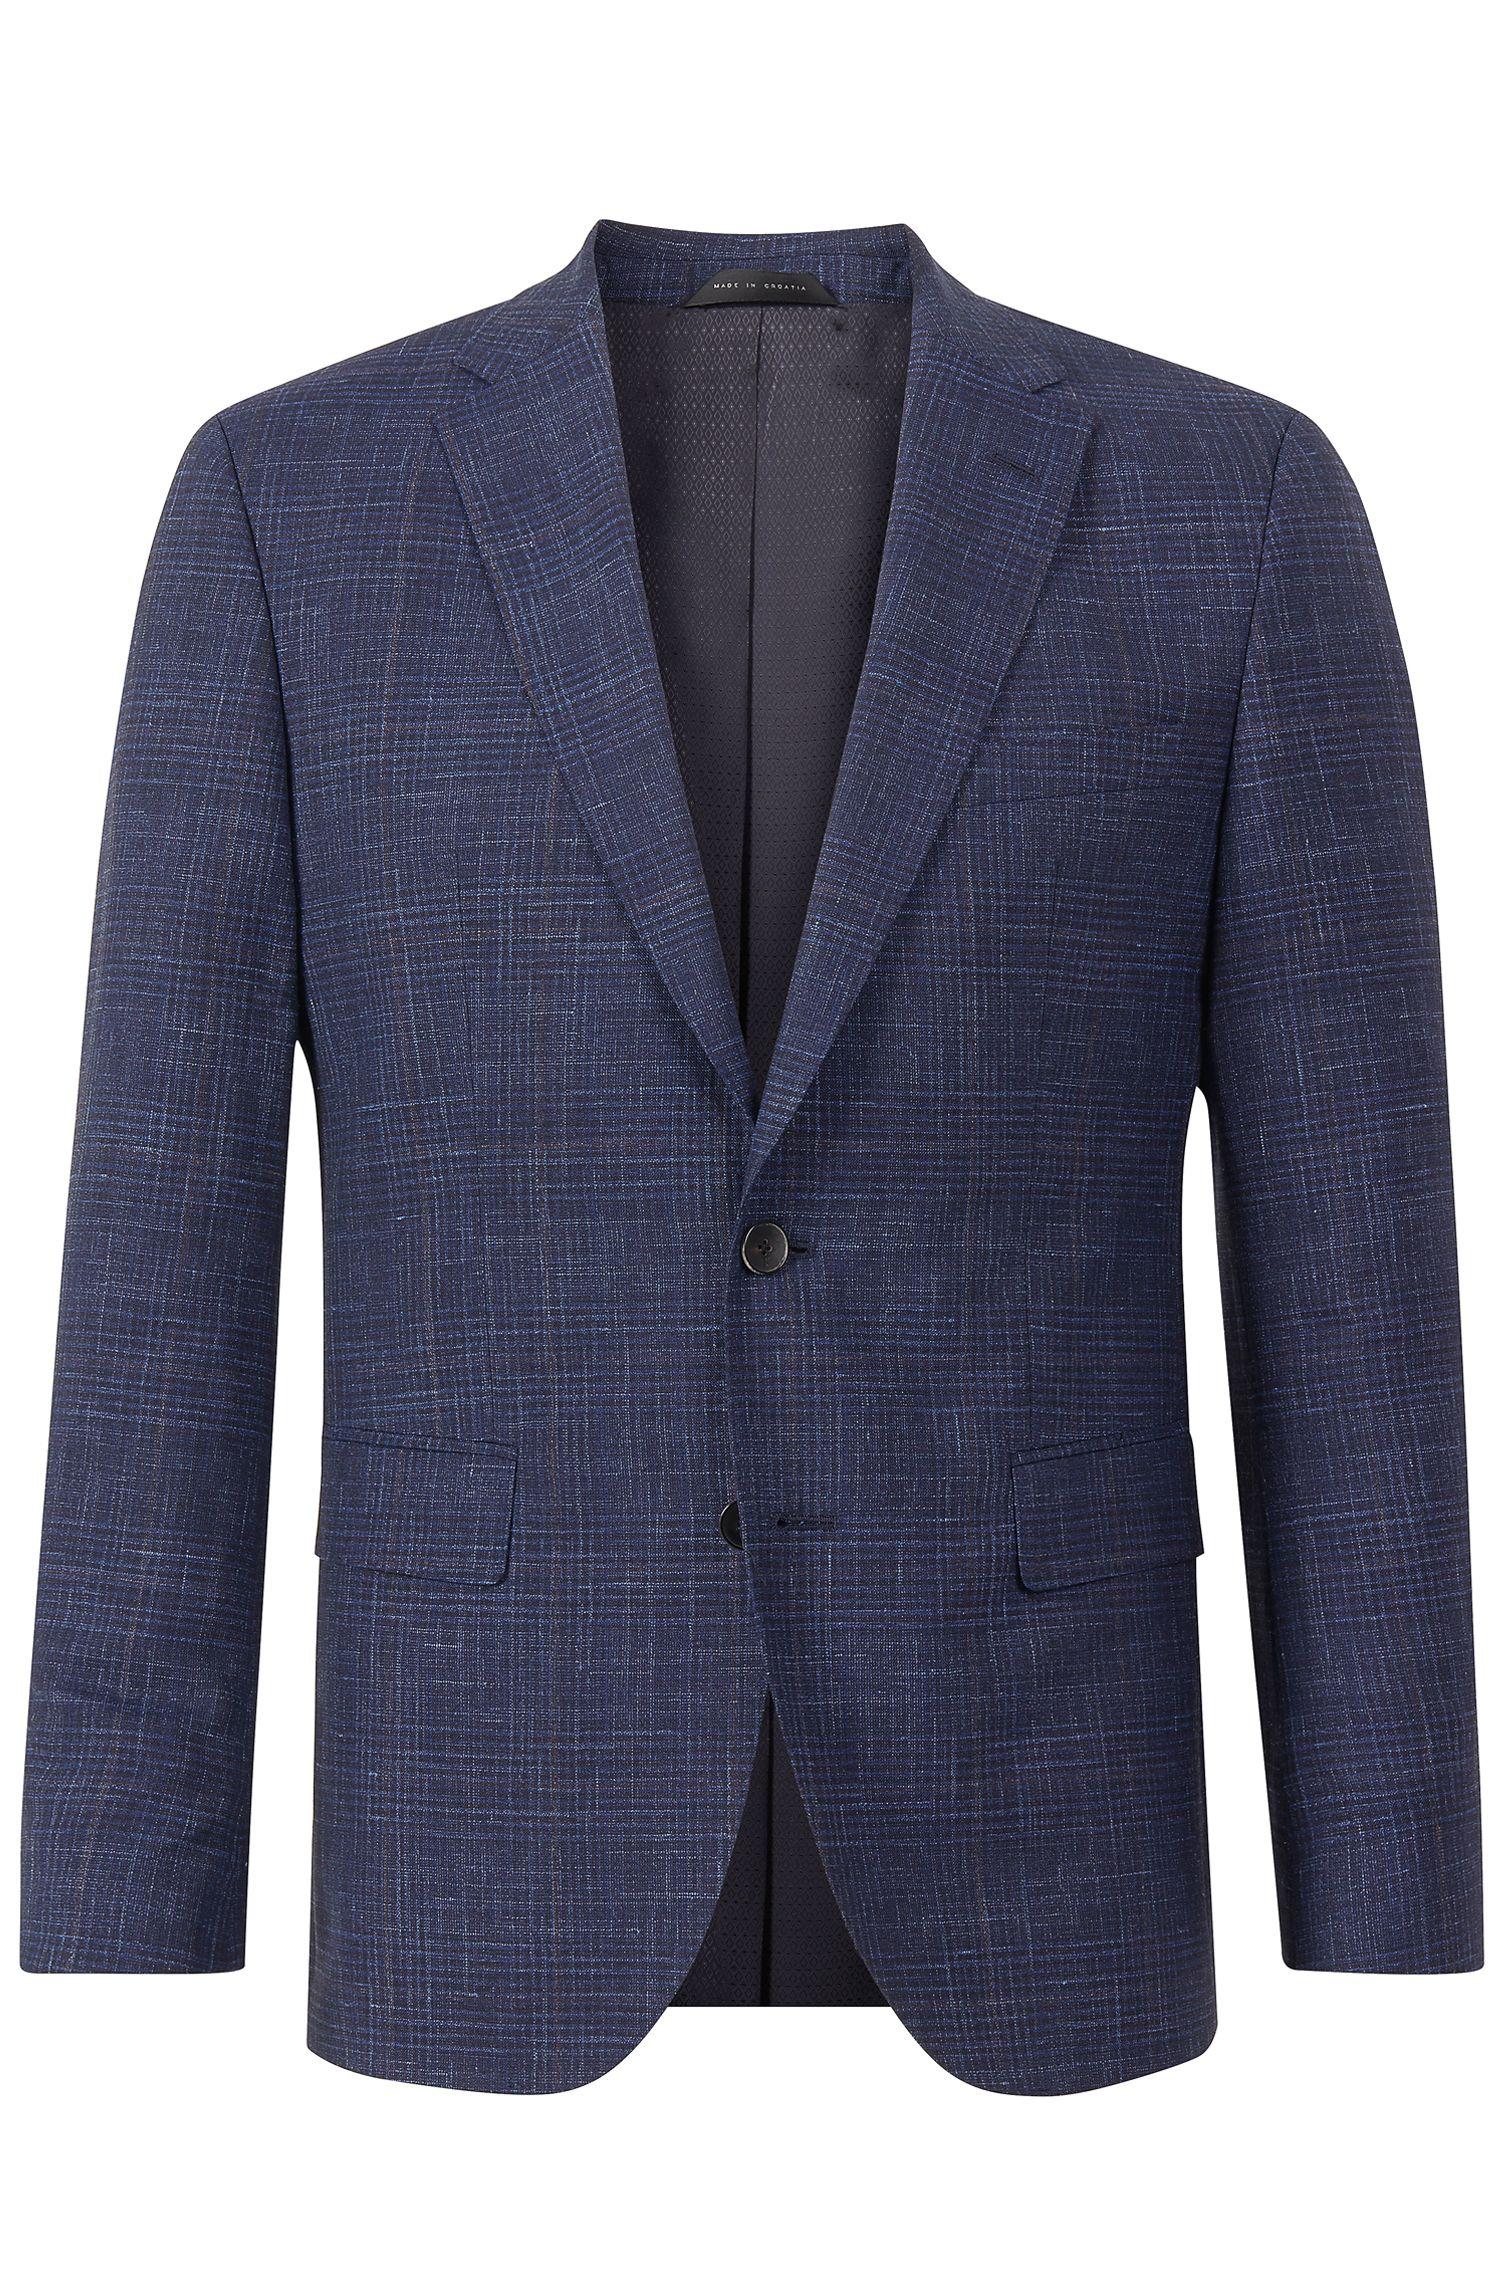 'Jeen' | Regular Fit, Italian Wool Silk Linen Sport Coat